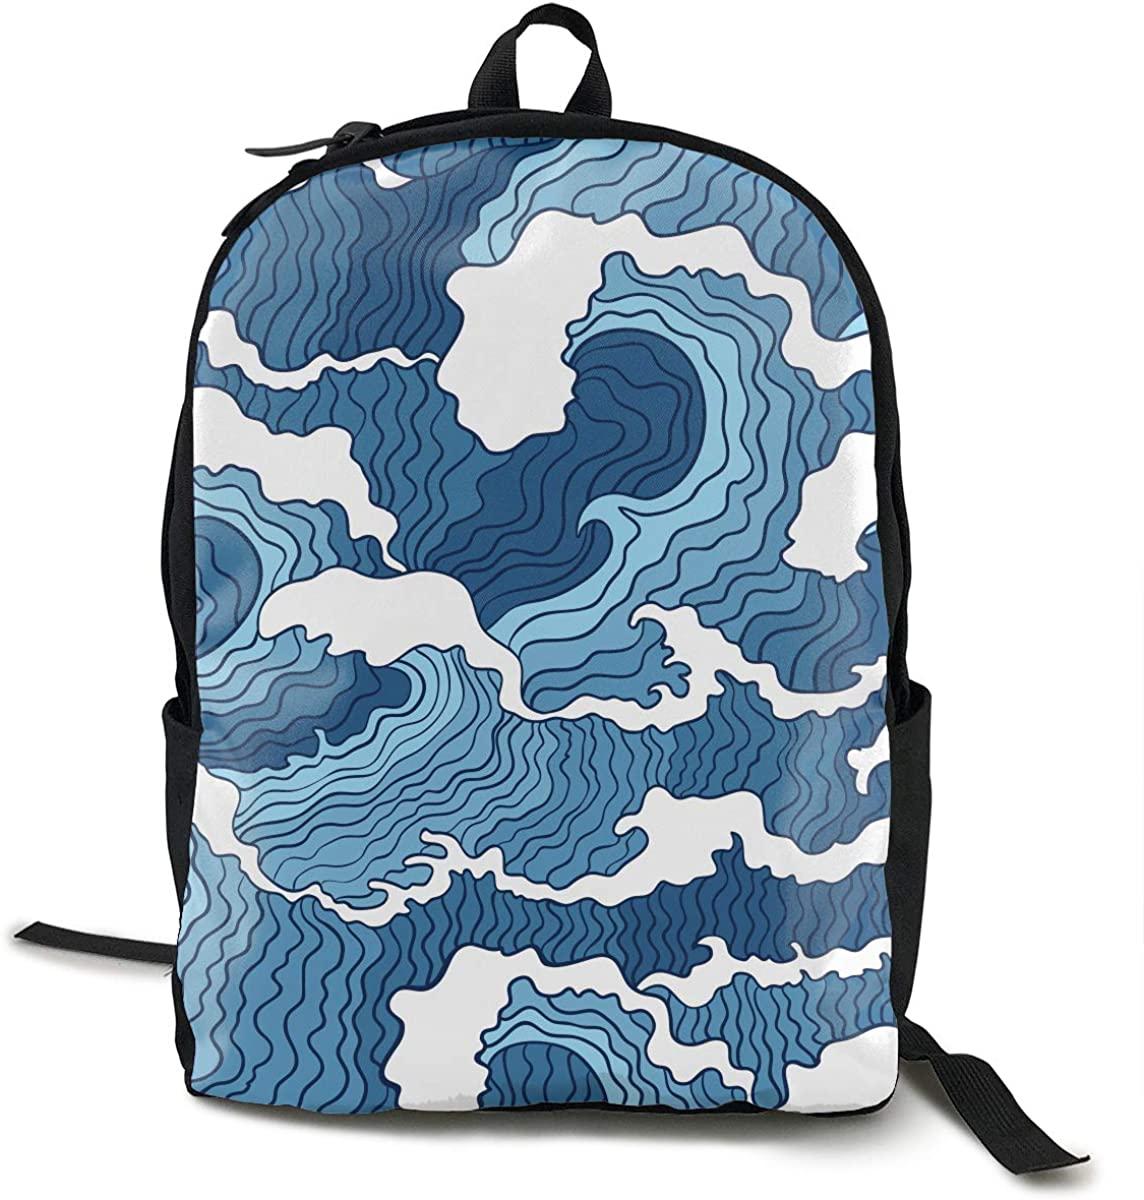 O-X_X-O Women Men Classic Polyester Backpack School Bag Travel Laptop Rucksack